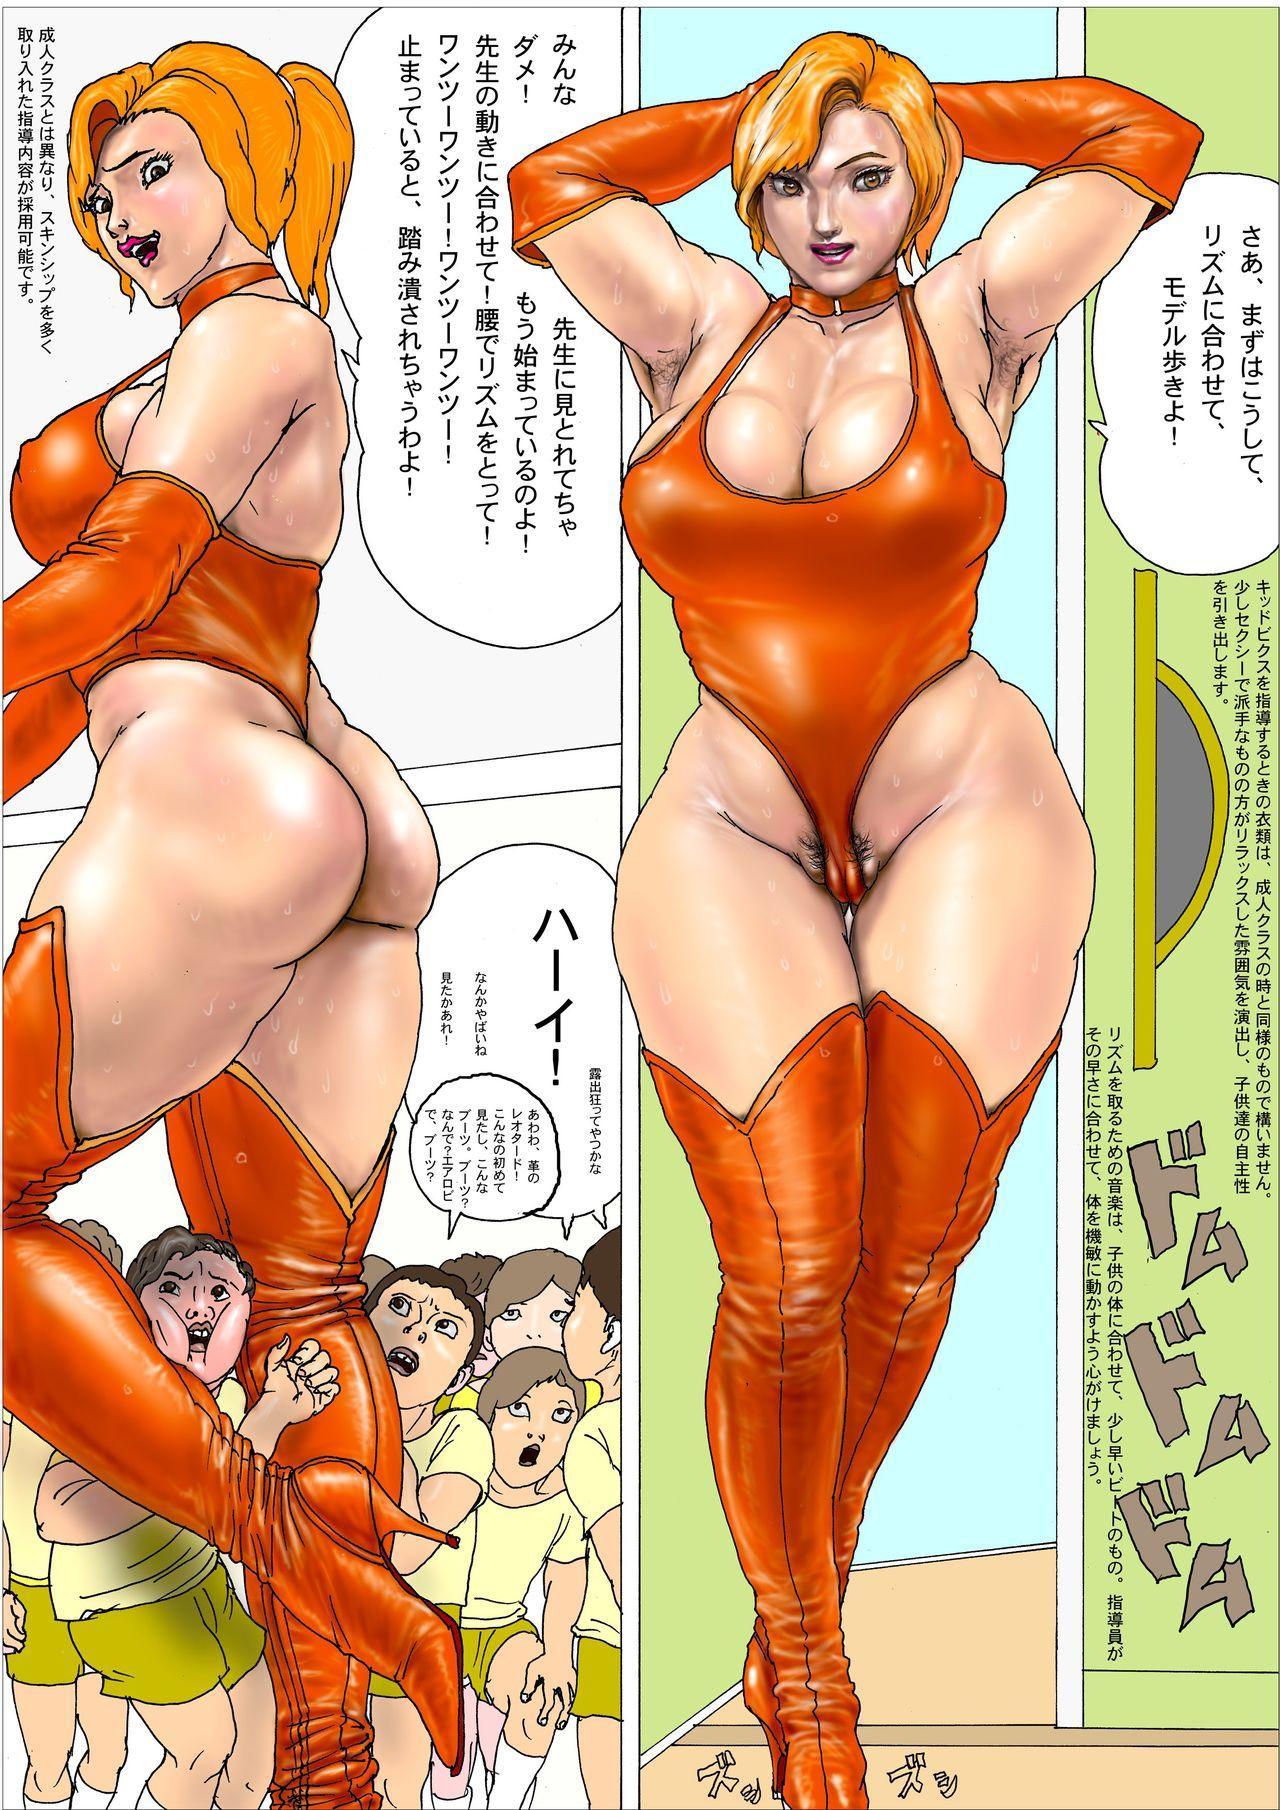 Kyosei kara Kita Aerobi Instructor K - Aerobics Instructor K came from a huge star 3